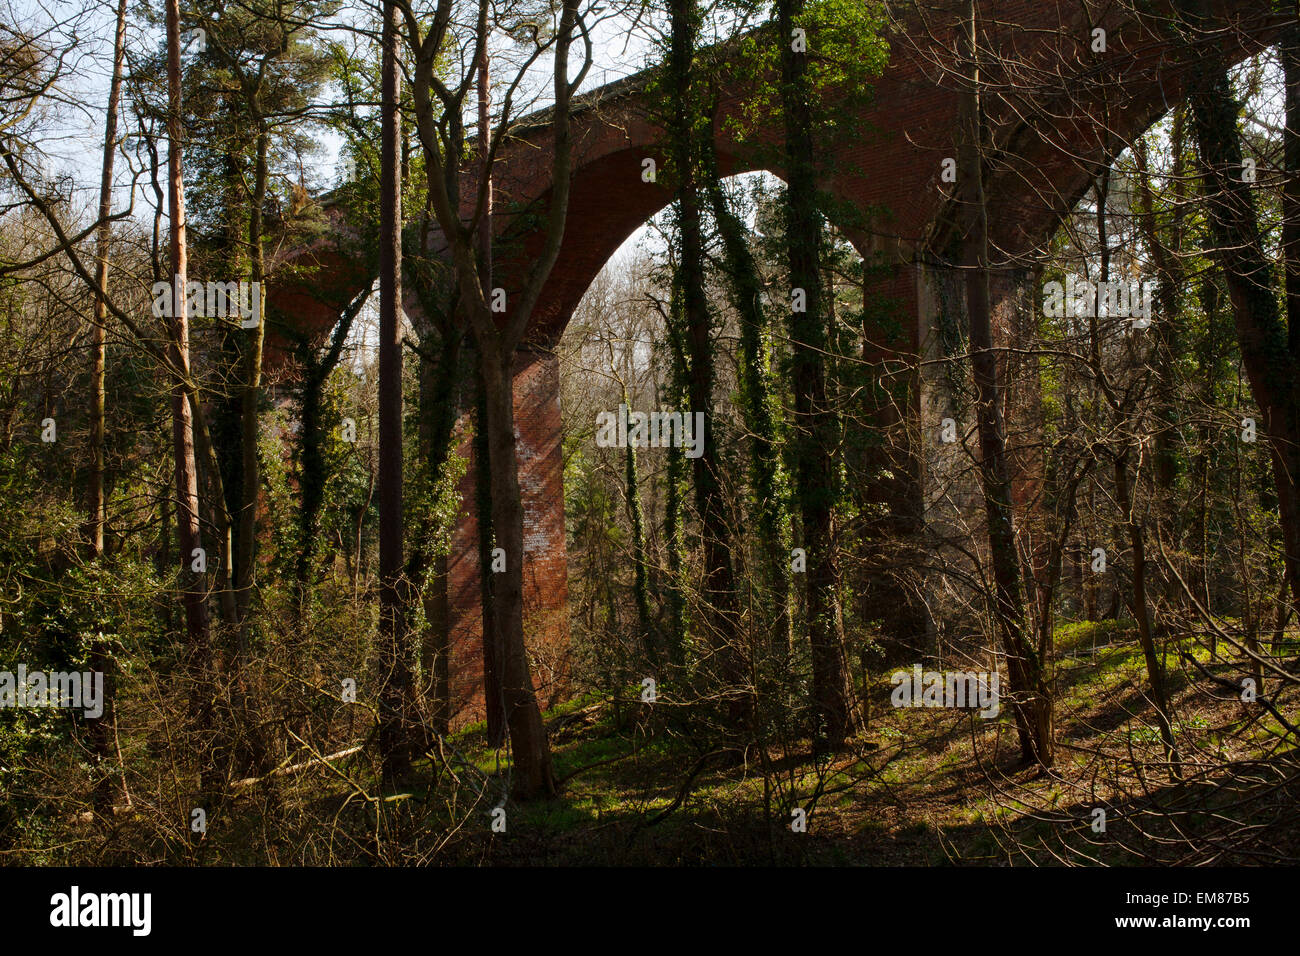 The Foegoesburn Viaduct that crosses the Foe Goes Burn in County Durham. Stock Photo